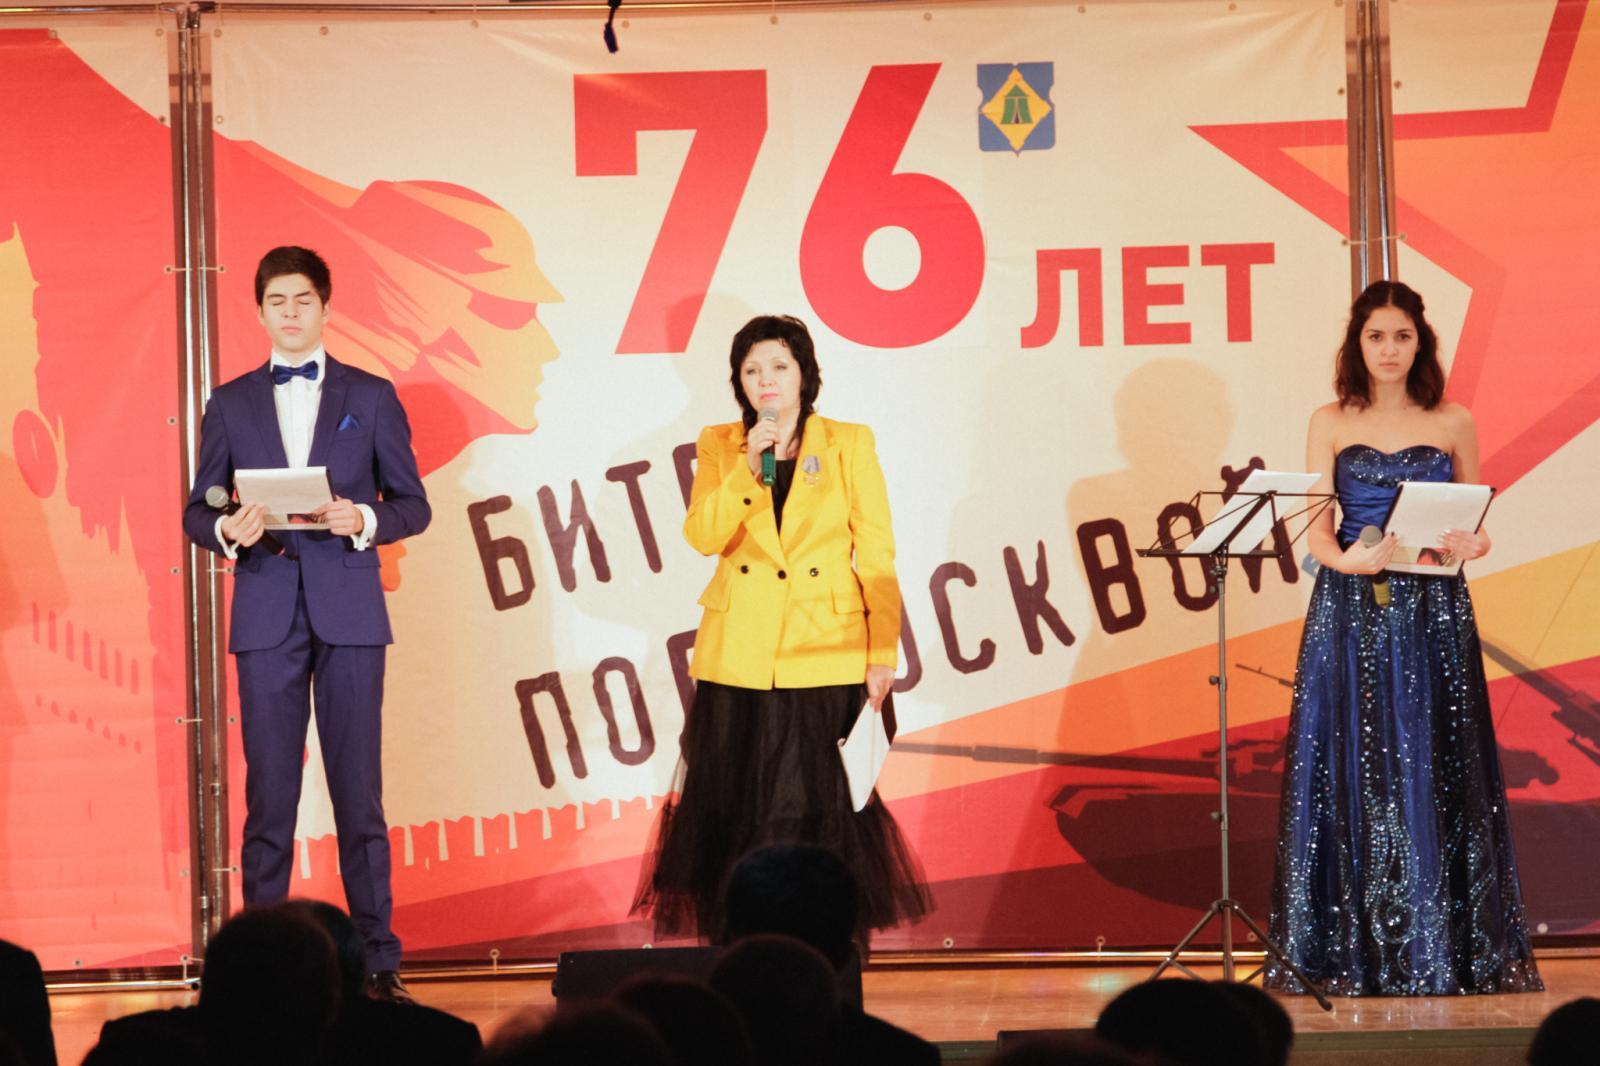 76 лет Битве под Москвой